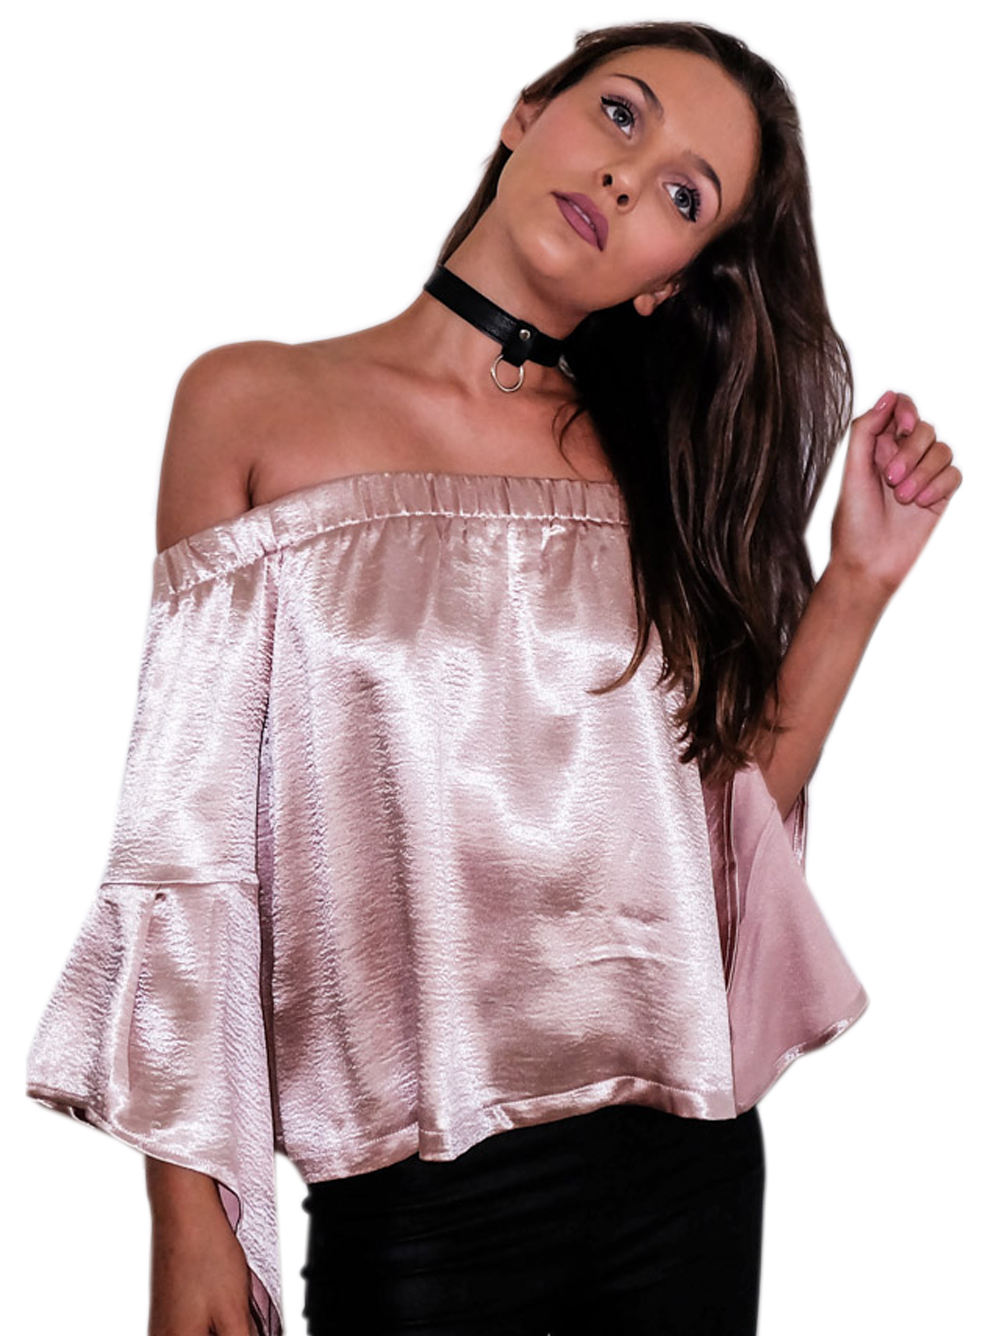 Buy Women's clothing at the lates fashion Women's clothing store |Men's clothing|Children's clothing |unm fashion |asia-fashion-wholesale.